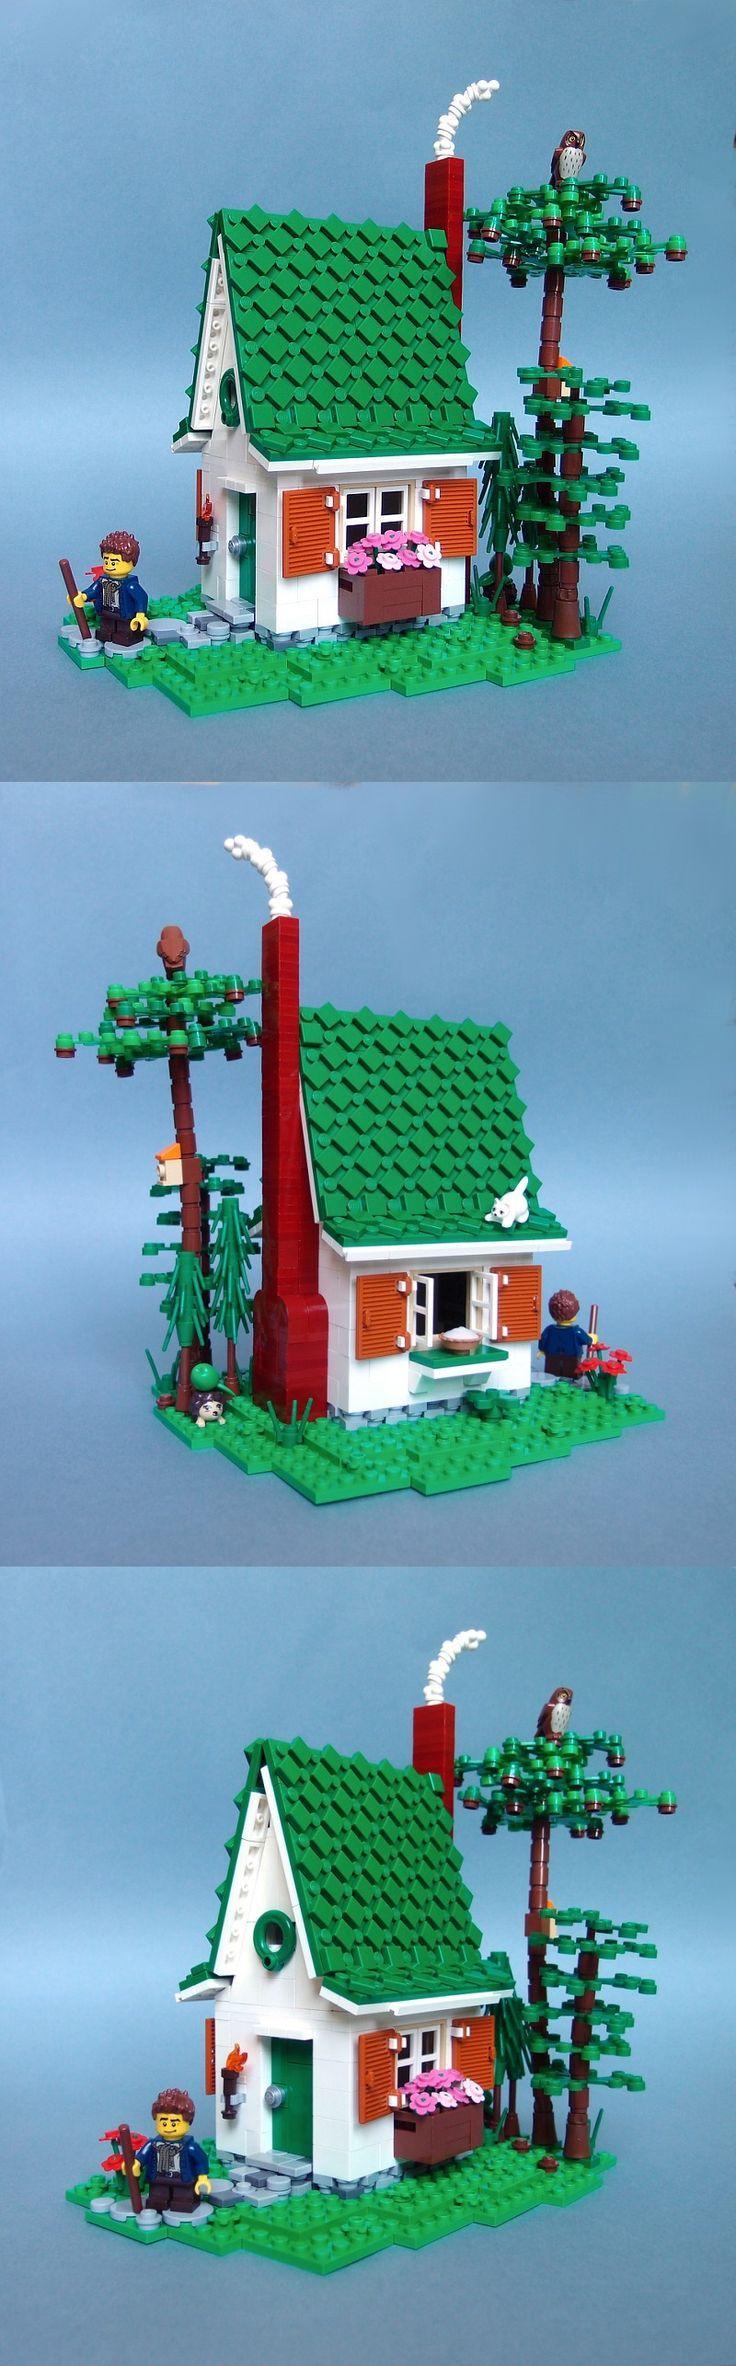 Best 25+ Lego house ideas on Pinterest | Lego creations, Awesome ...